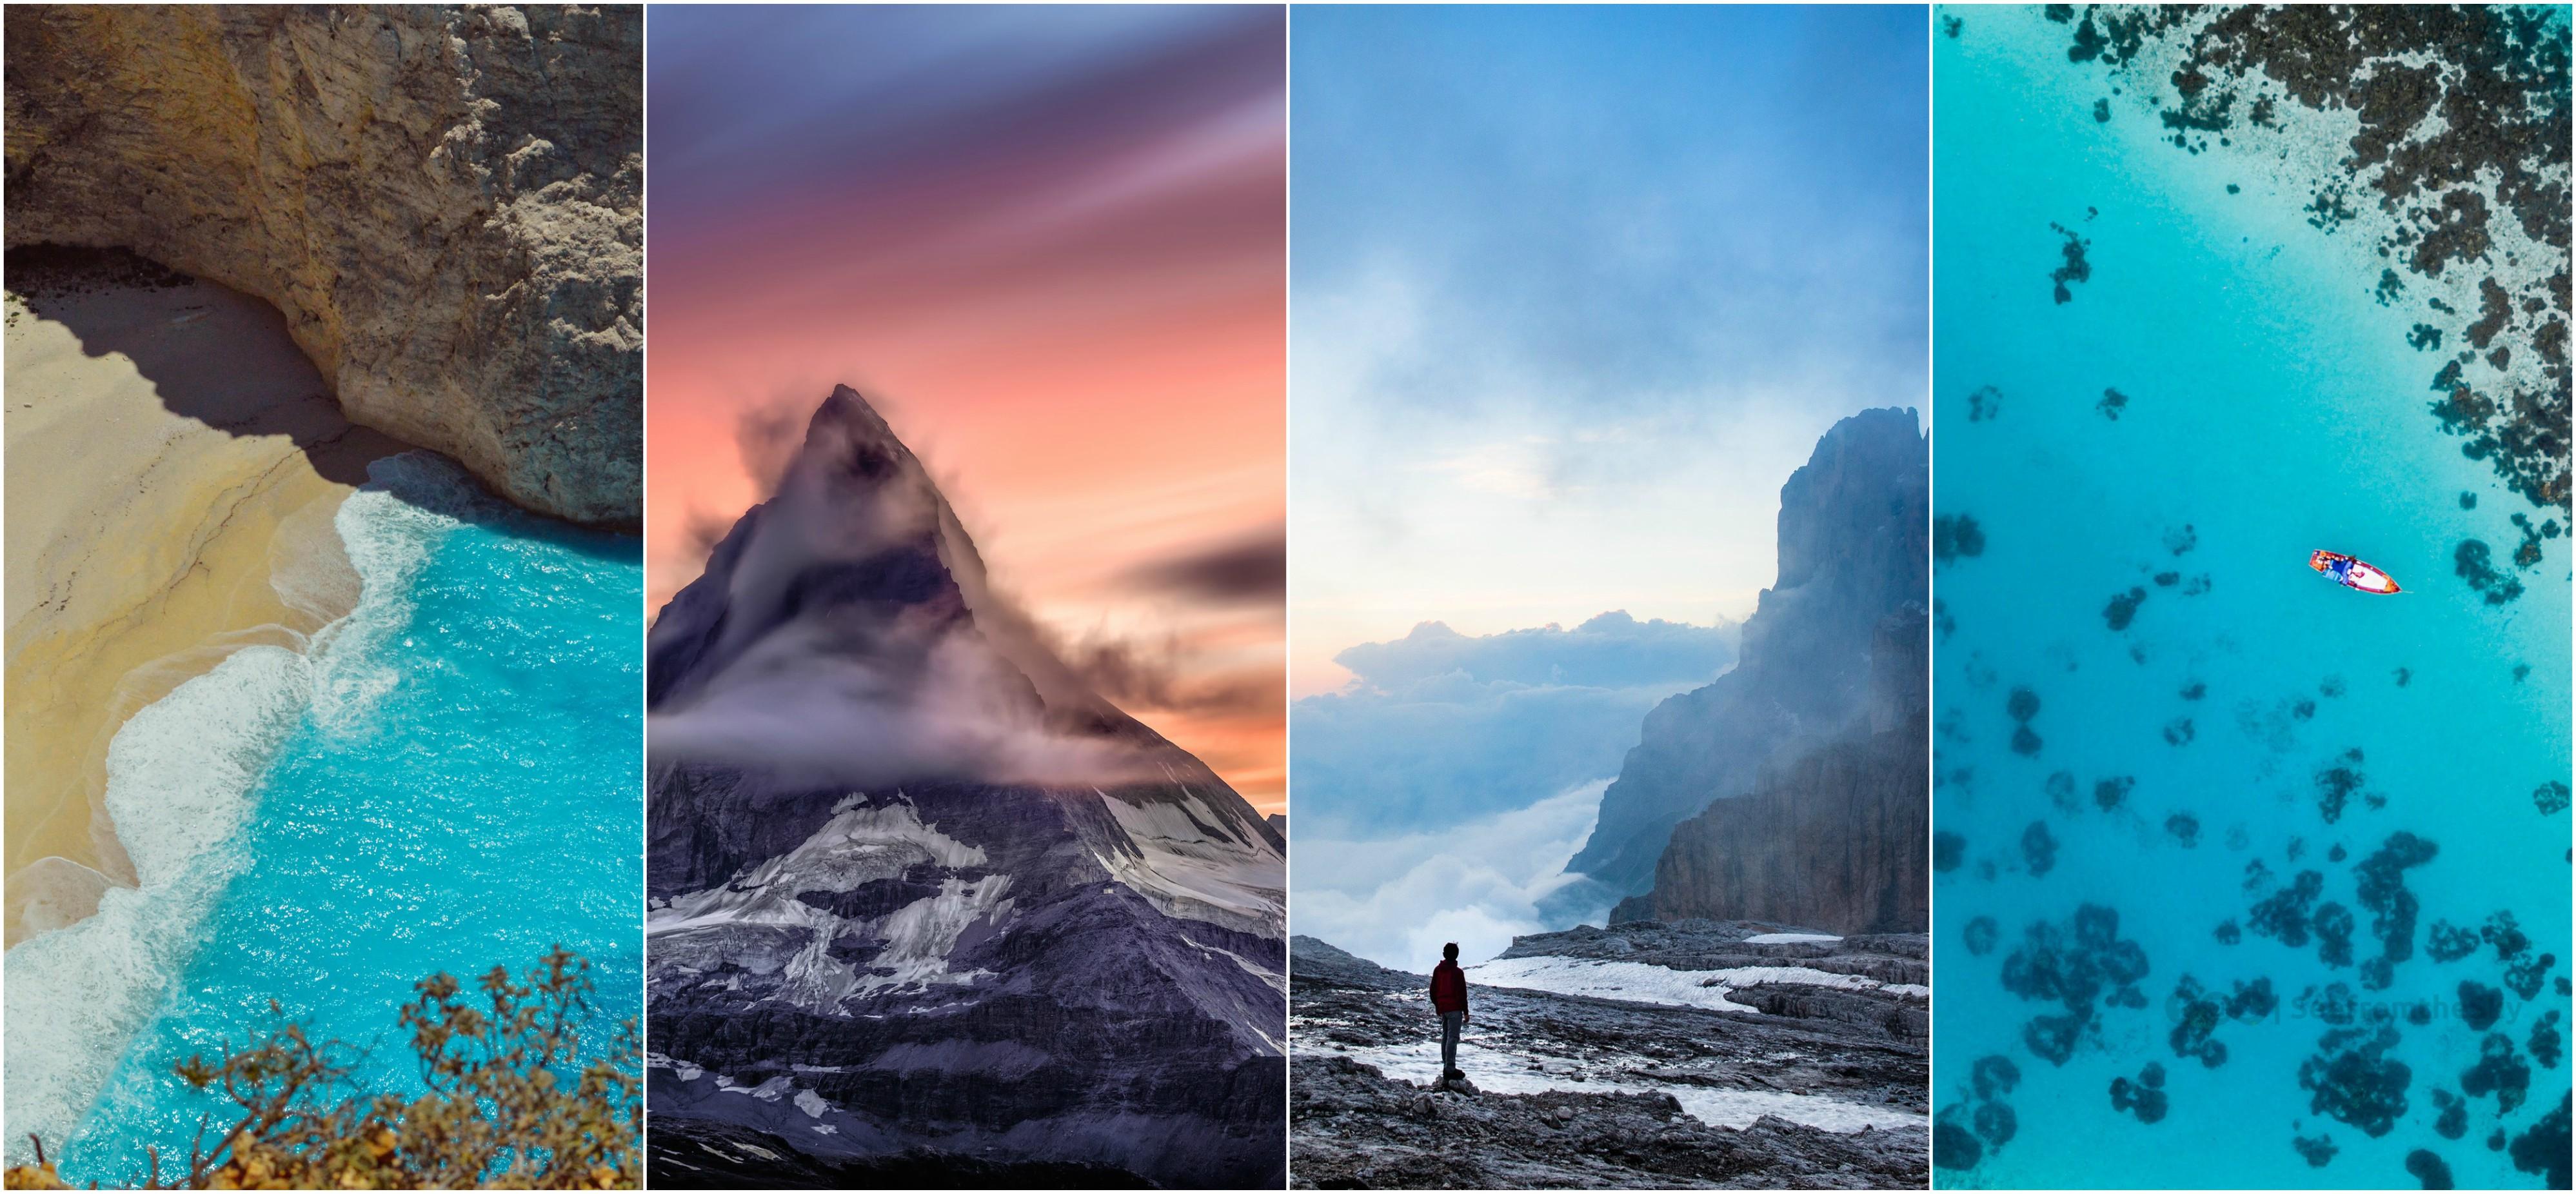 Fantastic Wallpaper Mountain Lock Screen - 7b0c1779-3495-48b0-a305-13d0c6a0cbfe  Image_169663.jpg